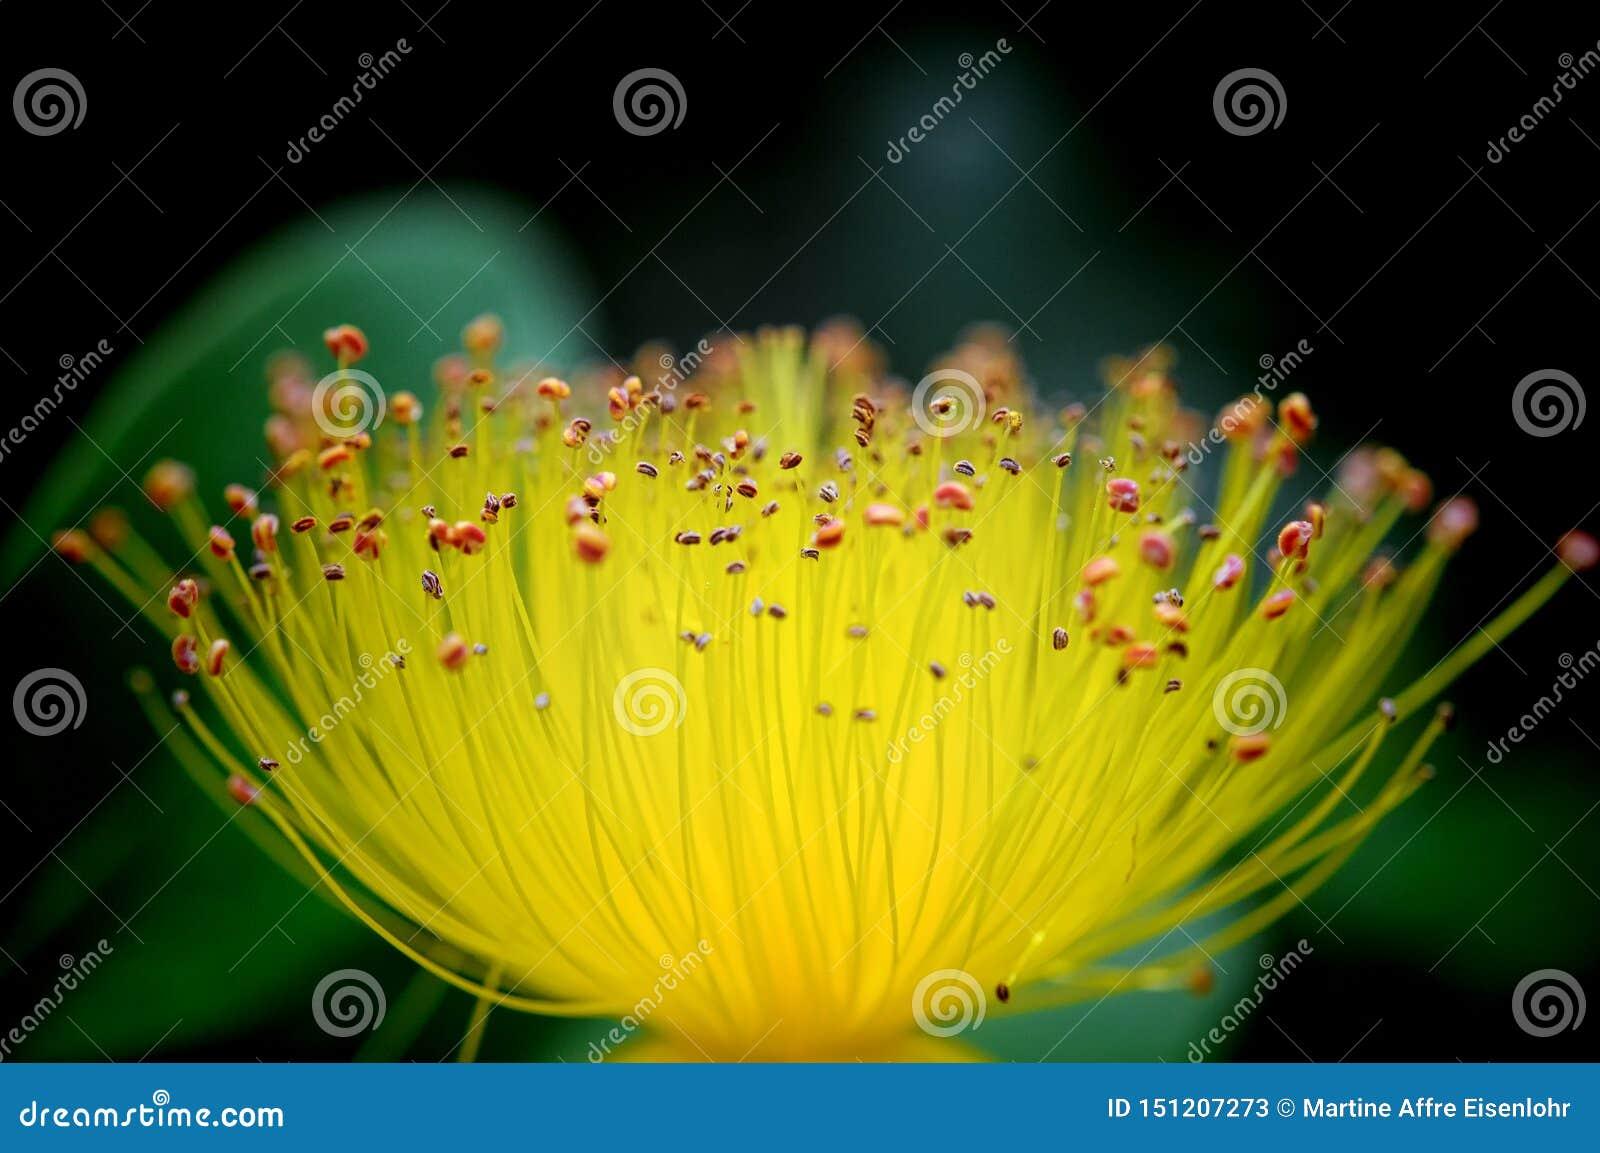 St. John`s wort flower macro showing countless stamens